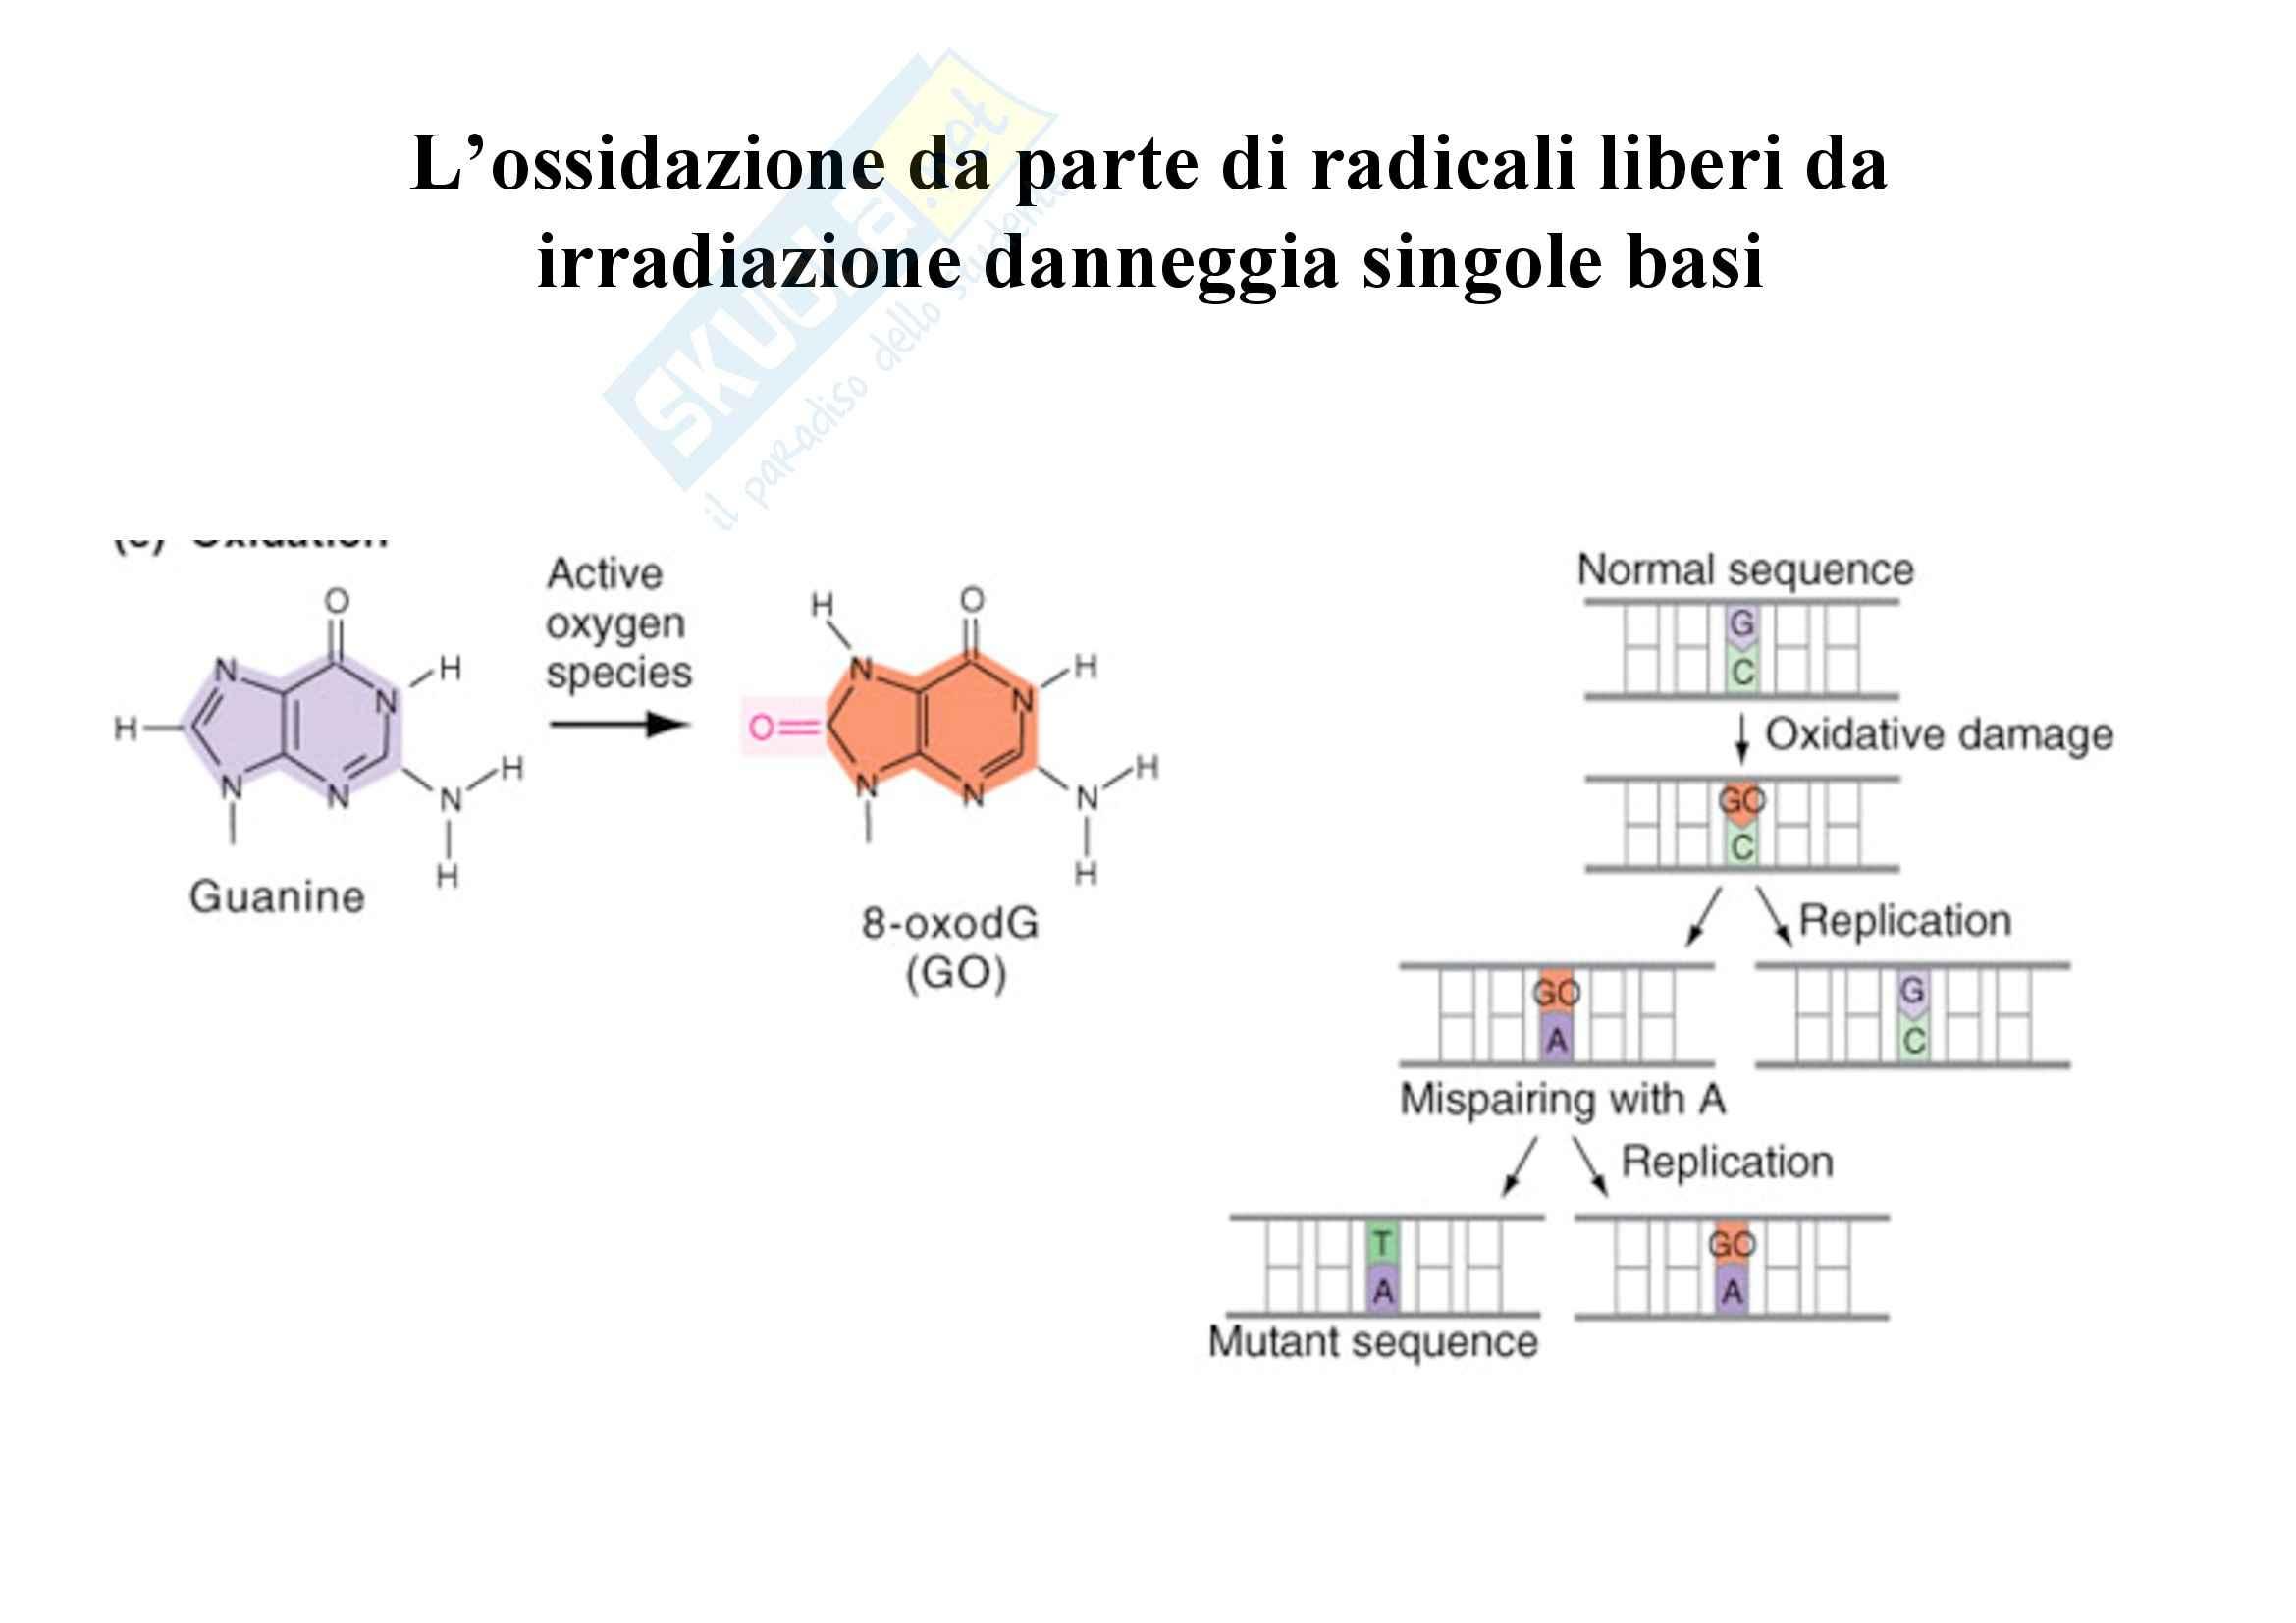 Genetica umana - alleli e Mendel - Appunti Pag. 6